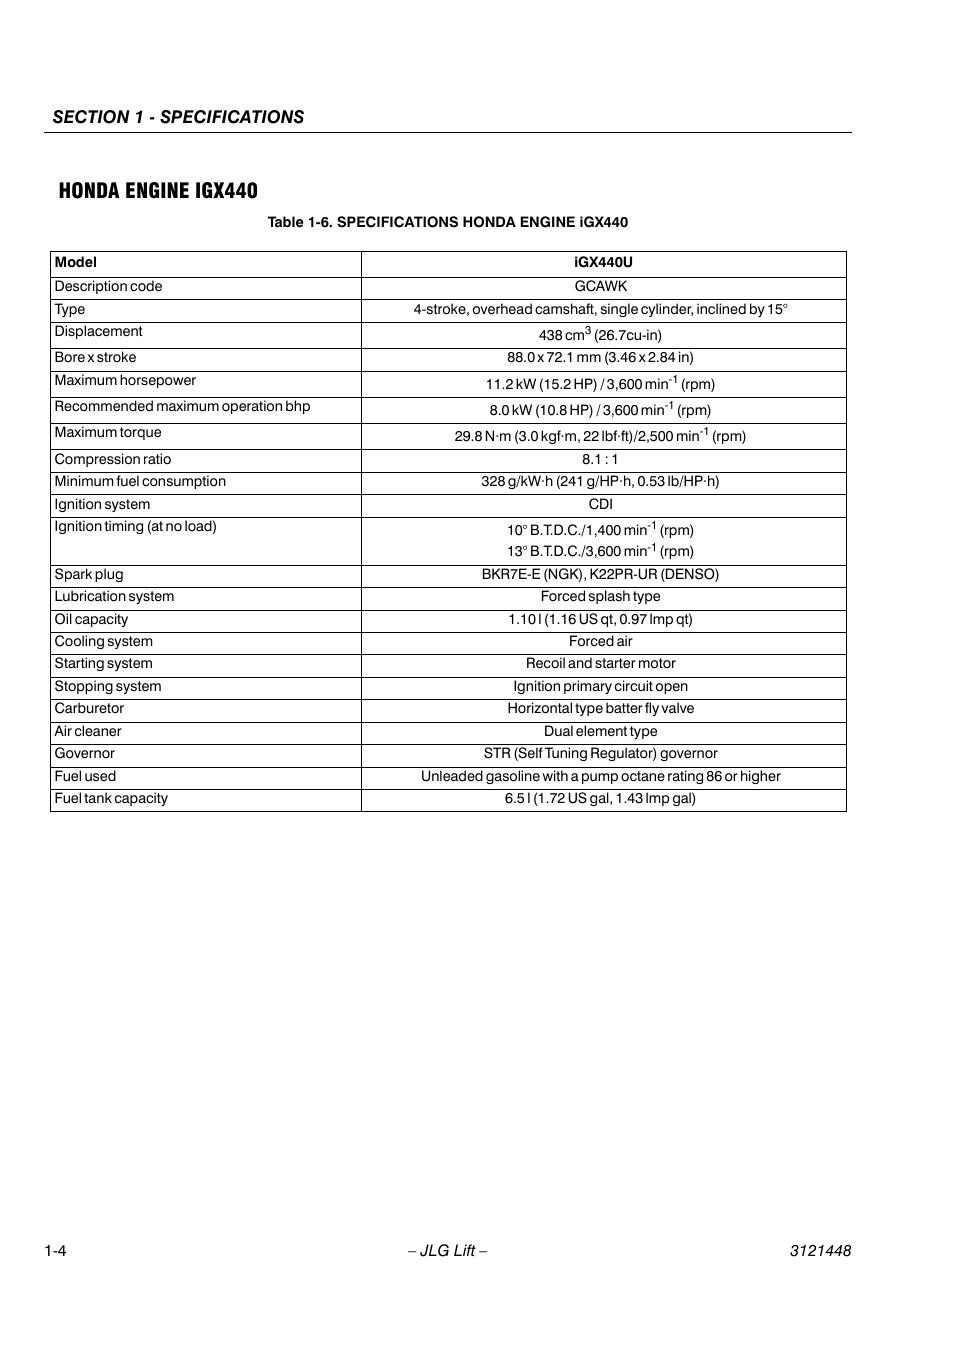 Honda engine igx440 | JLG X23J - X700AJ Service Manual User Manual | Page  12 / 633